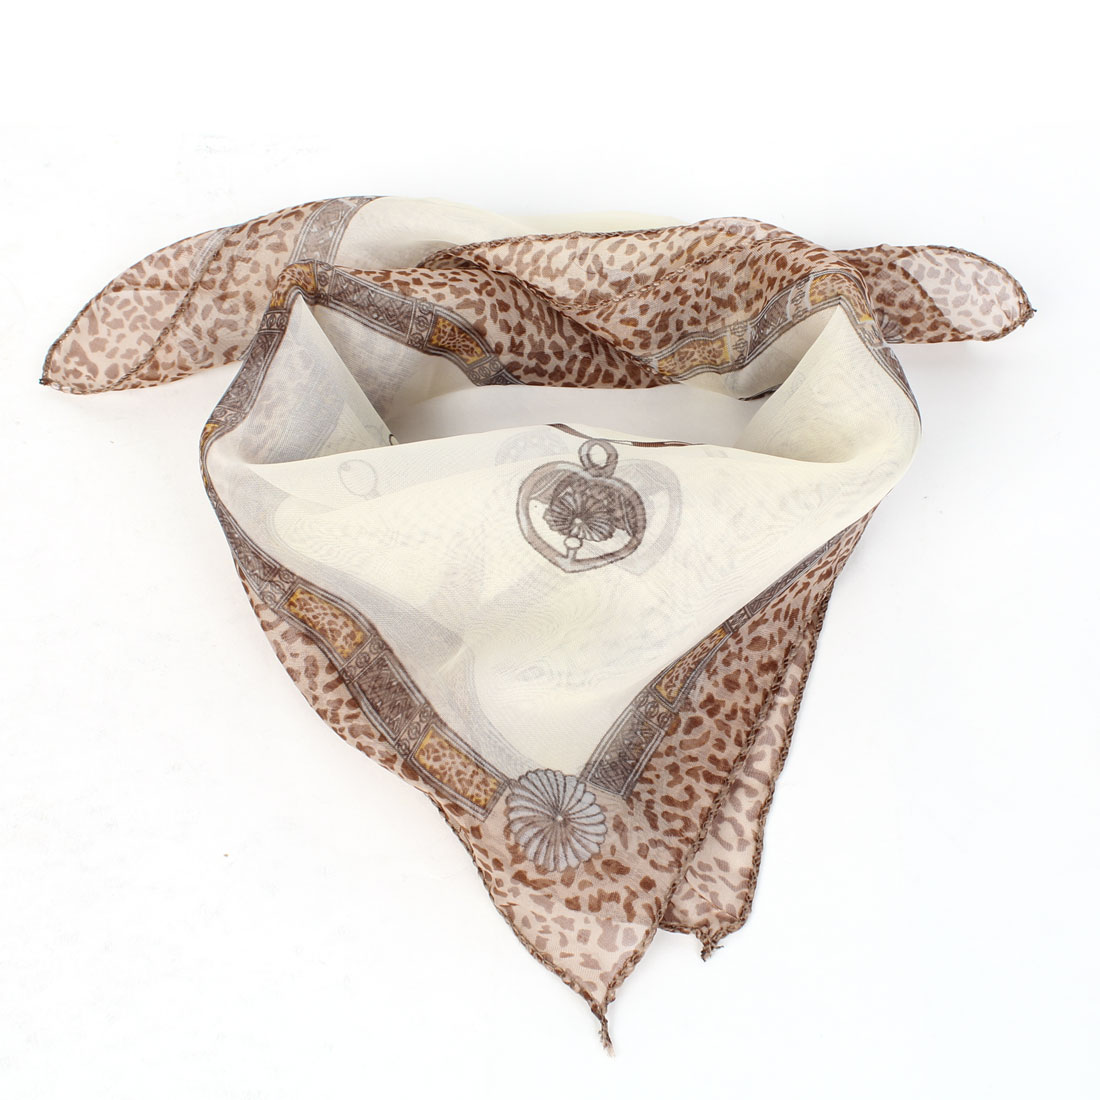 Beige Brown Leopard Ribbon Print Square Neck Scarf Neckerchief